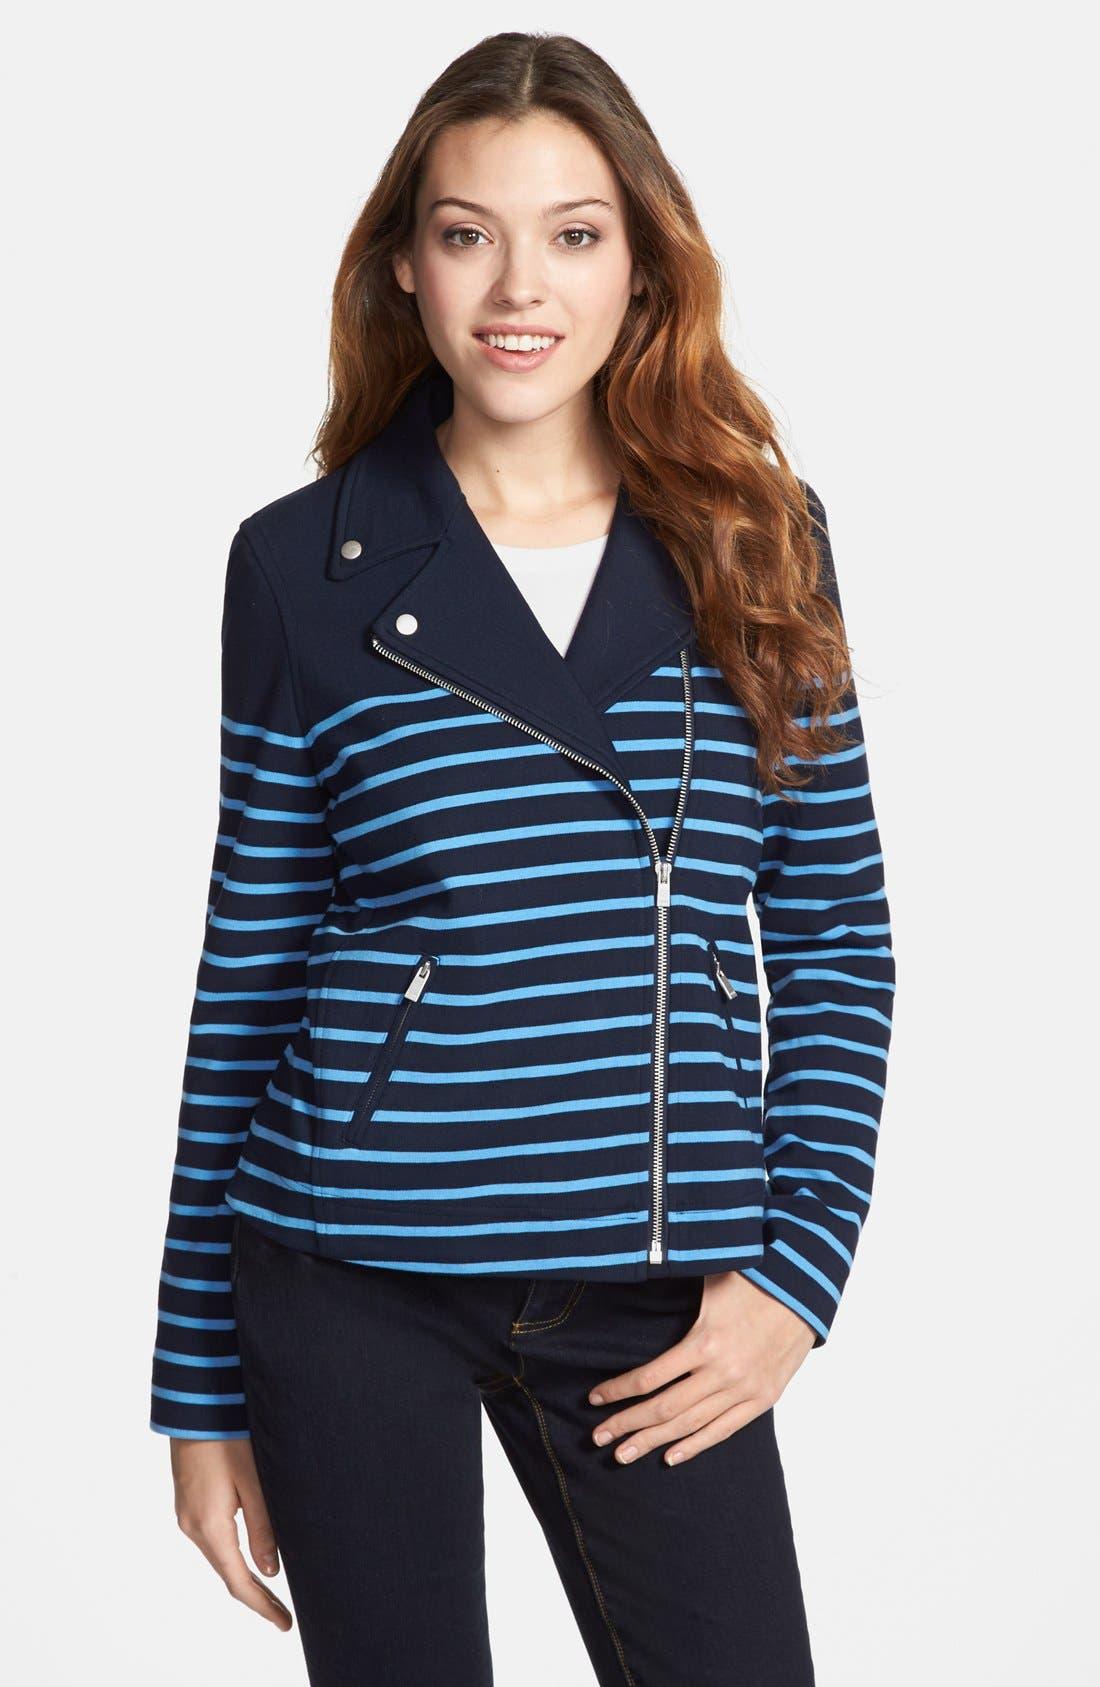 Main Image - NYDJ Stripe Ponte Knit Jacket